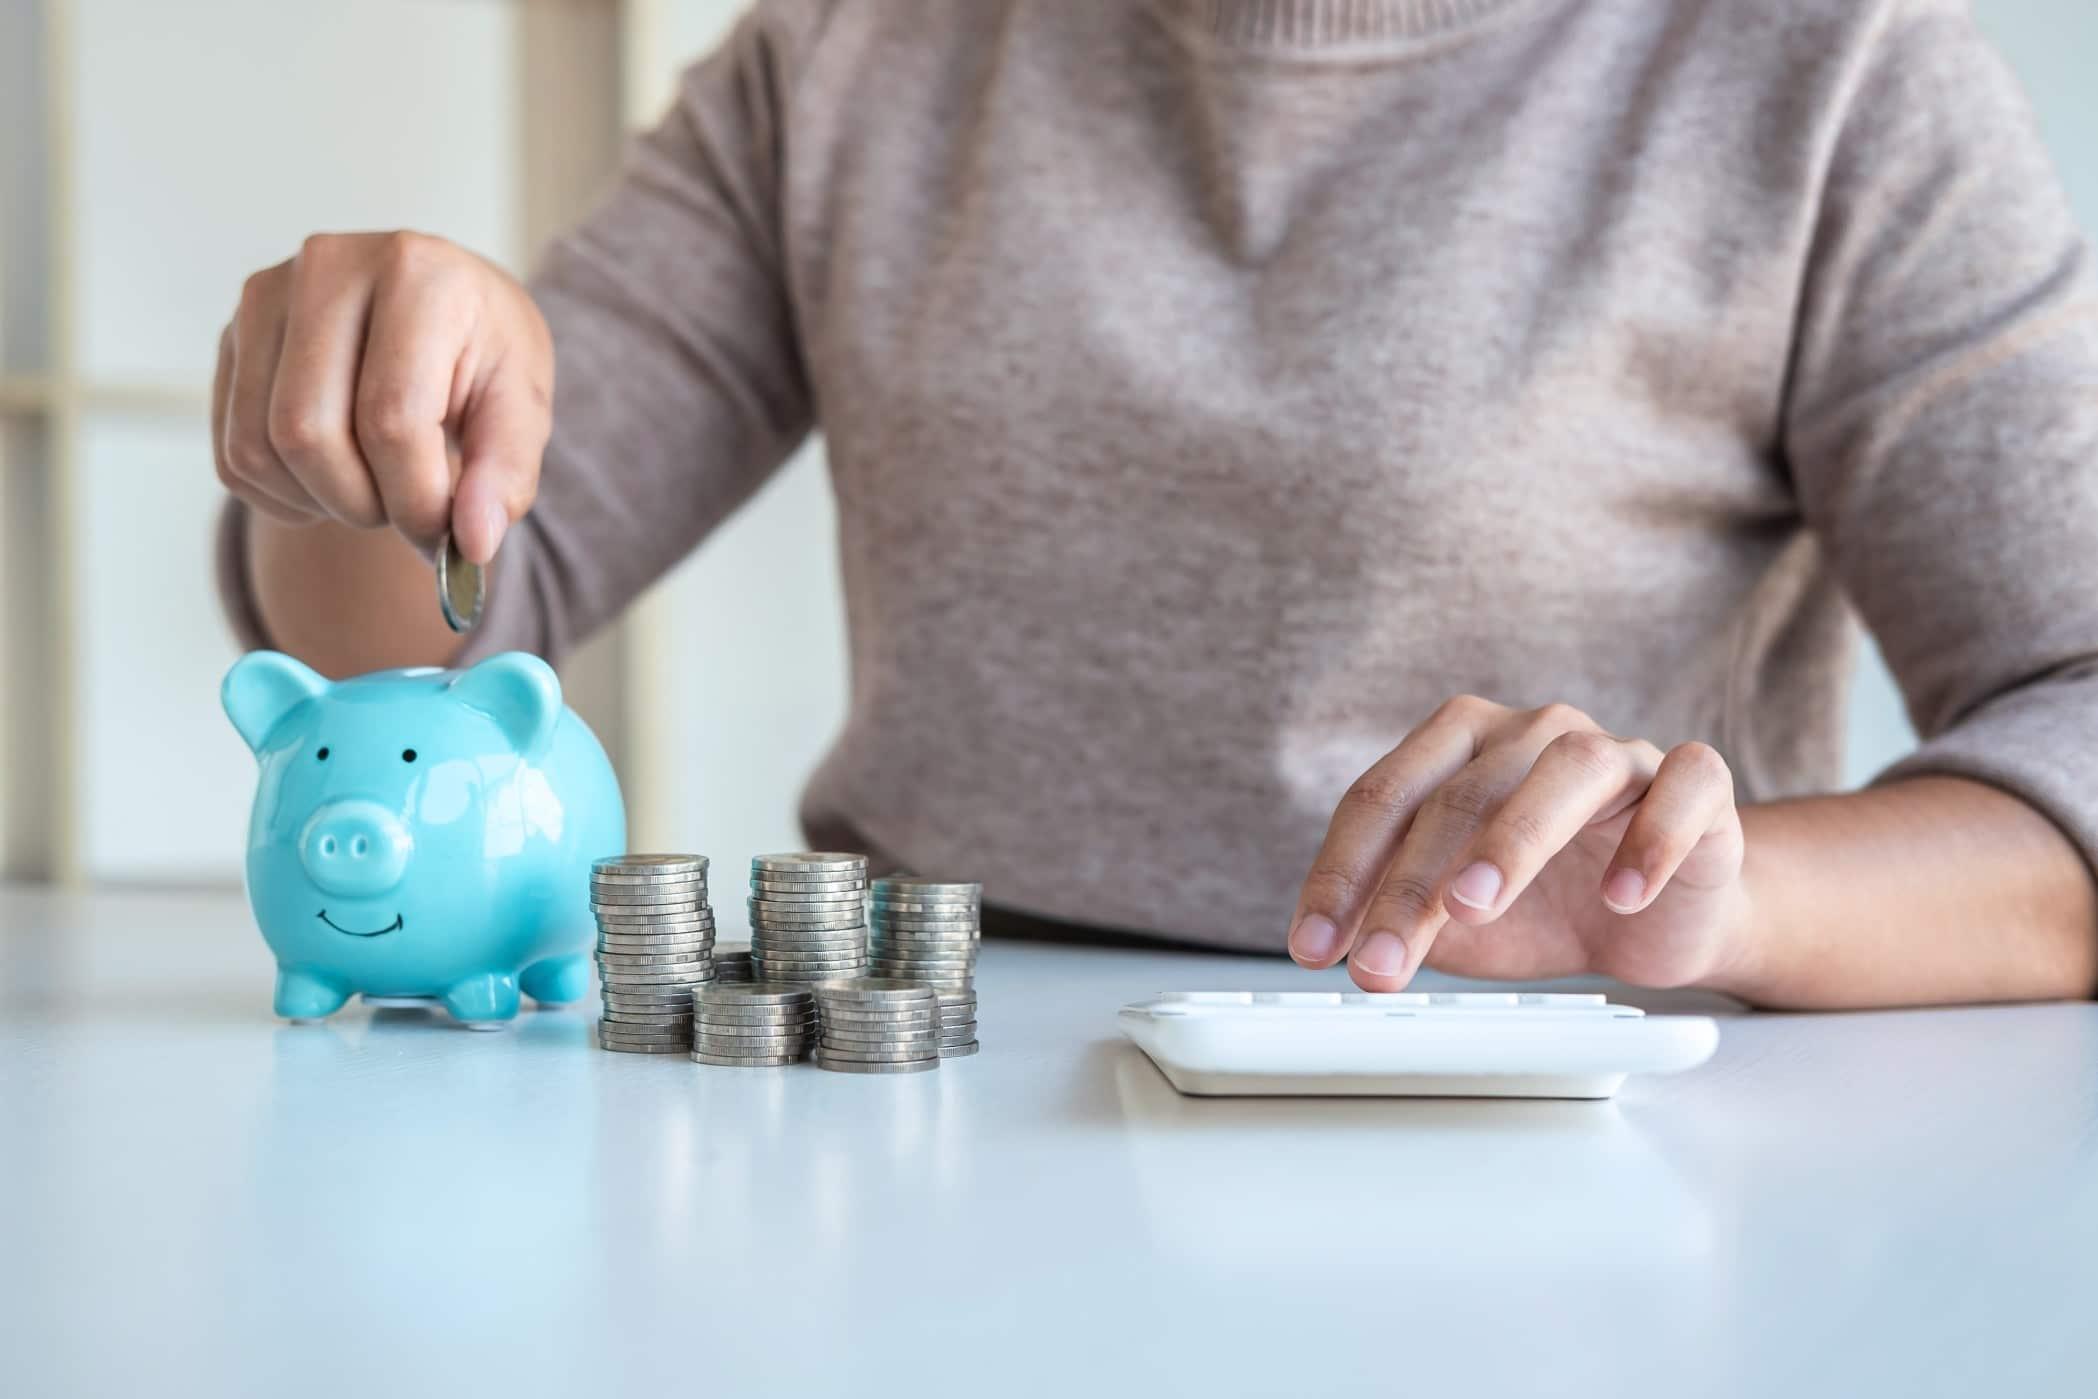 Woman putting coins into a blue piggy bank